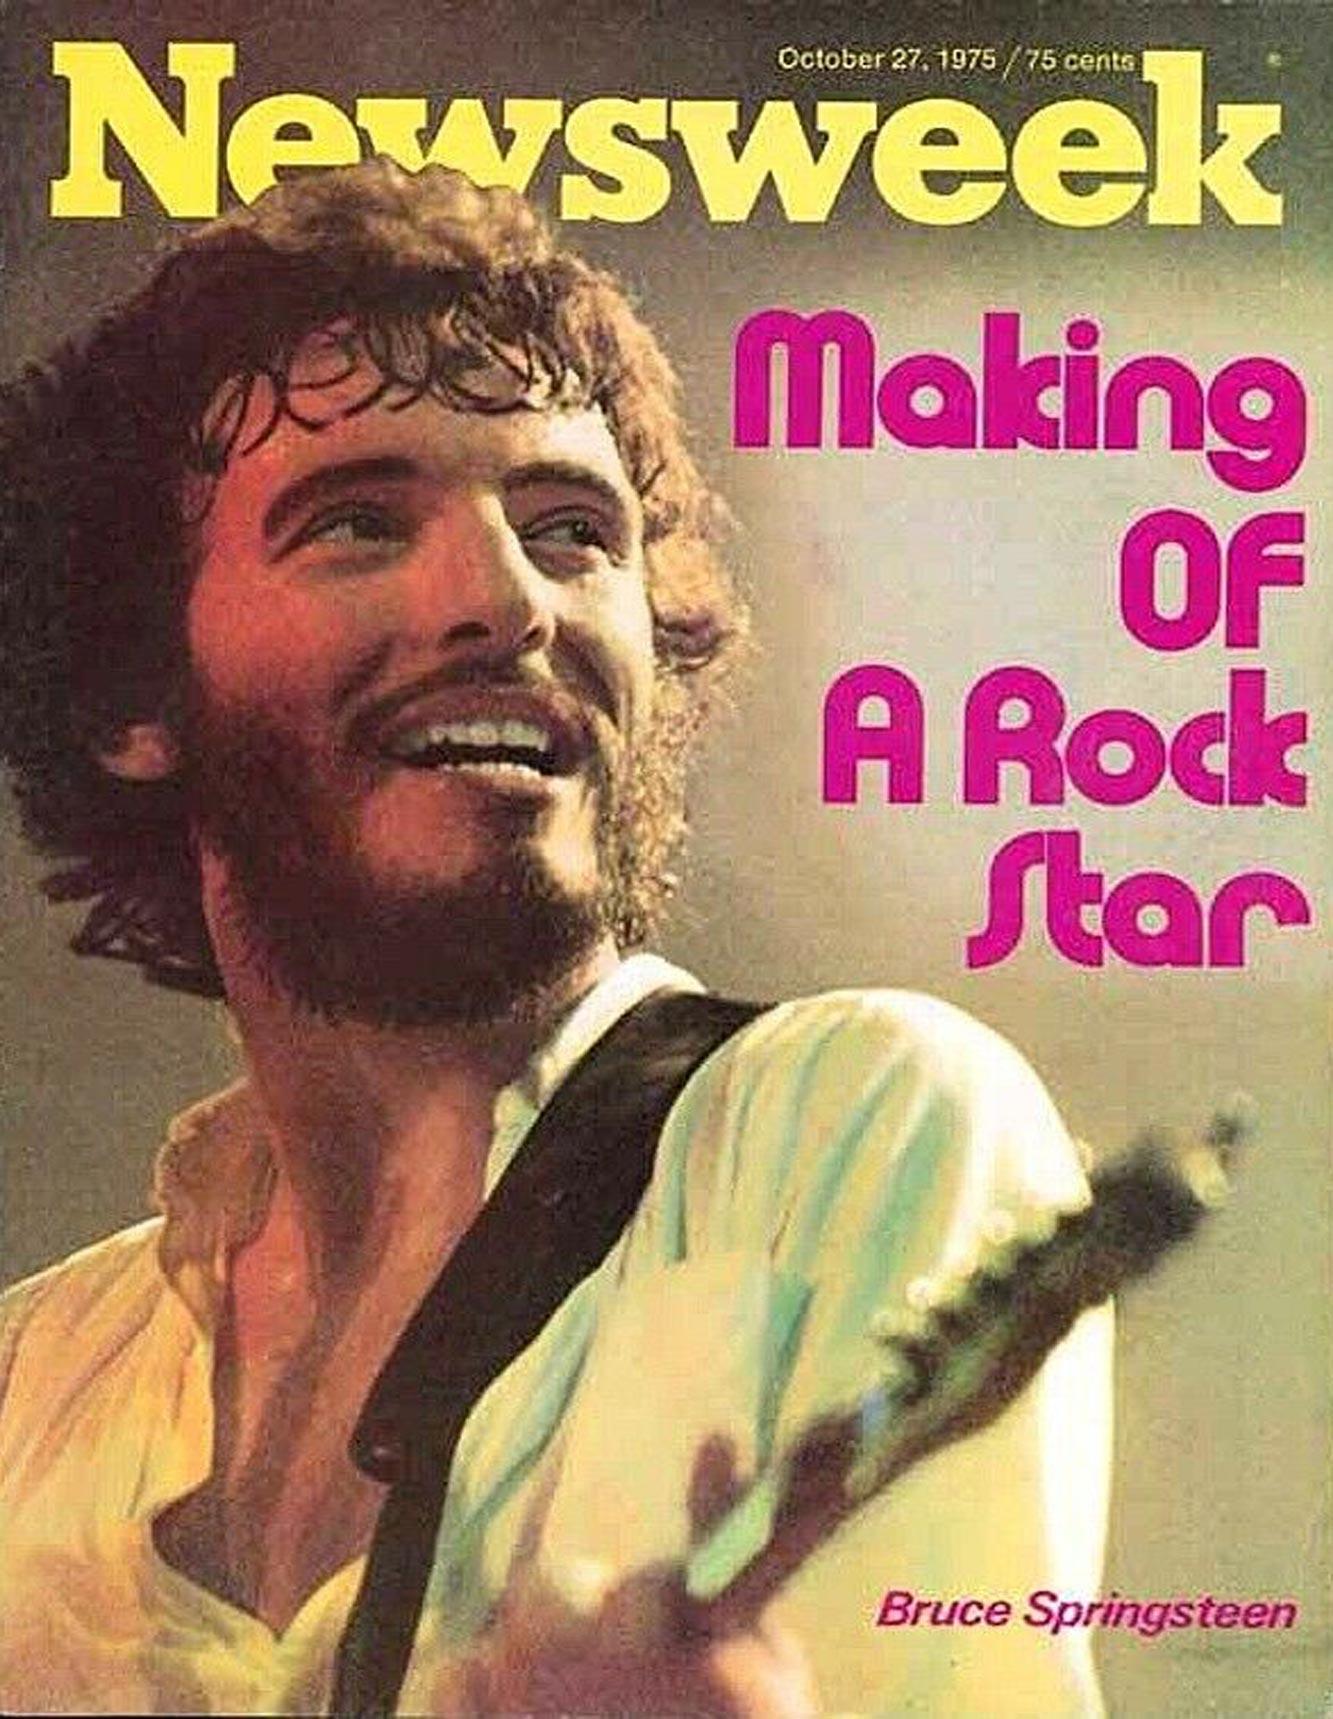 Bruce Springsteen 1975 Newsweek cover